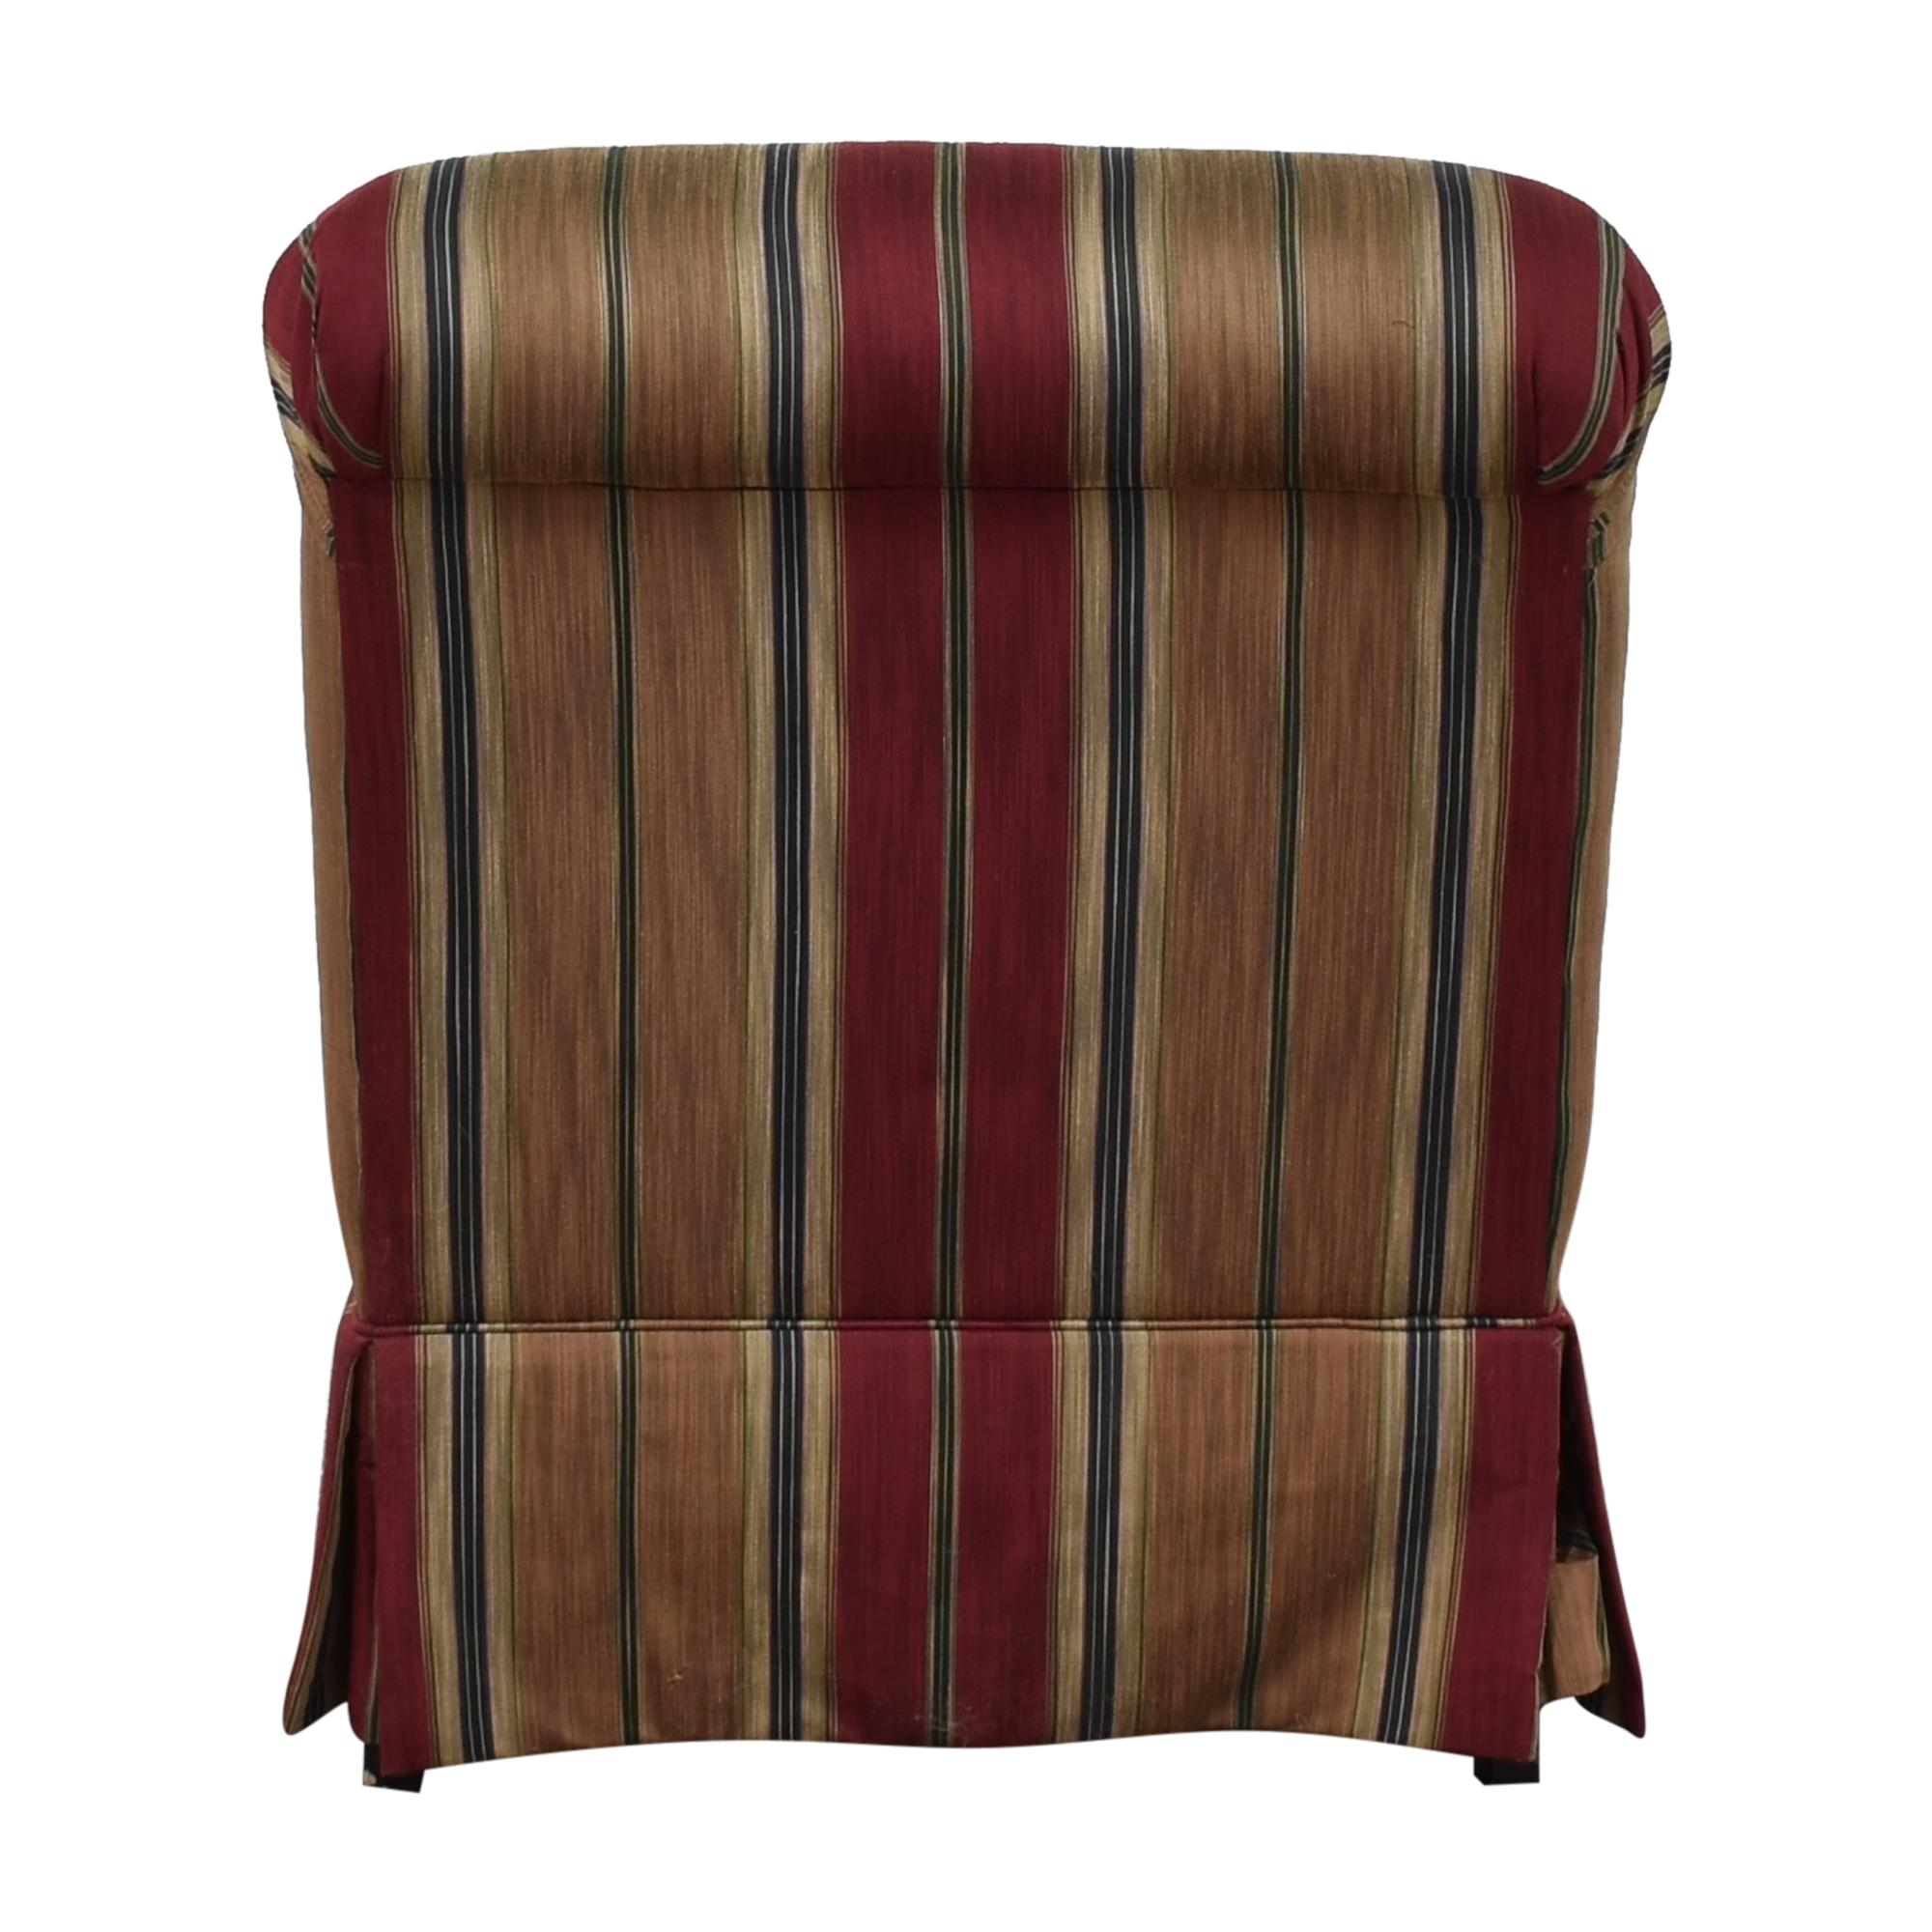 buy J. Royale Furniture J. Royale Furniture Upholstered Armless Chair online